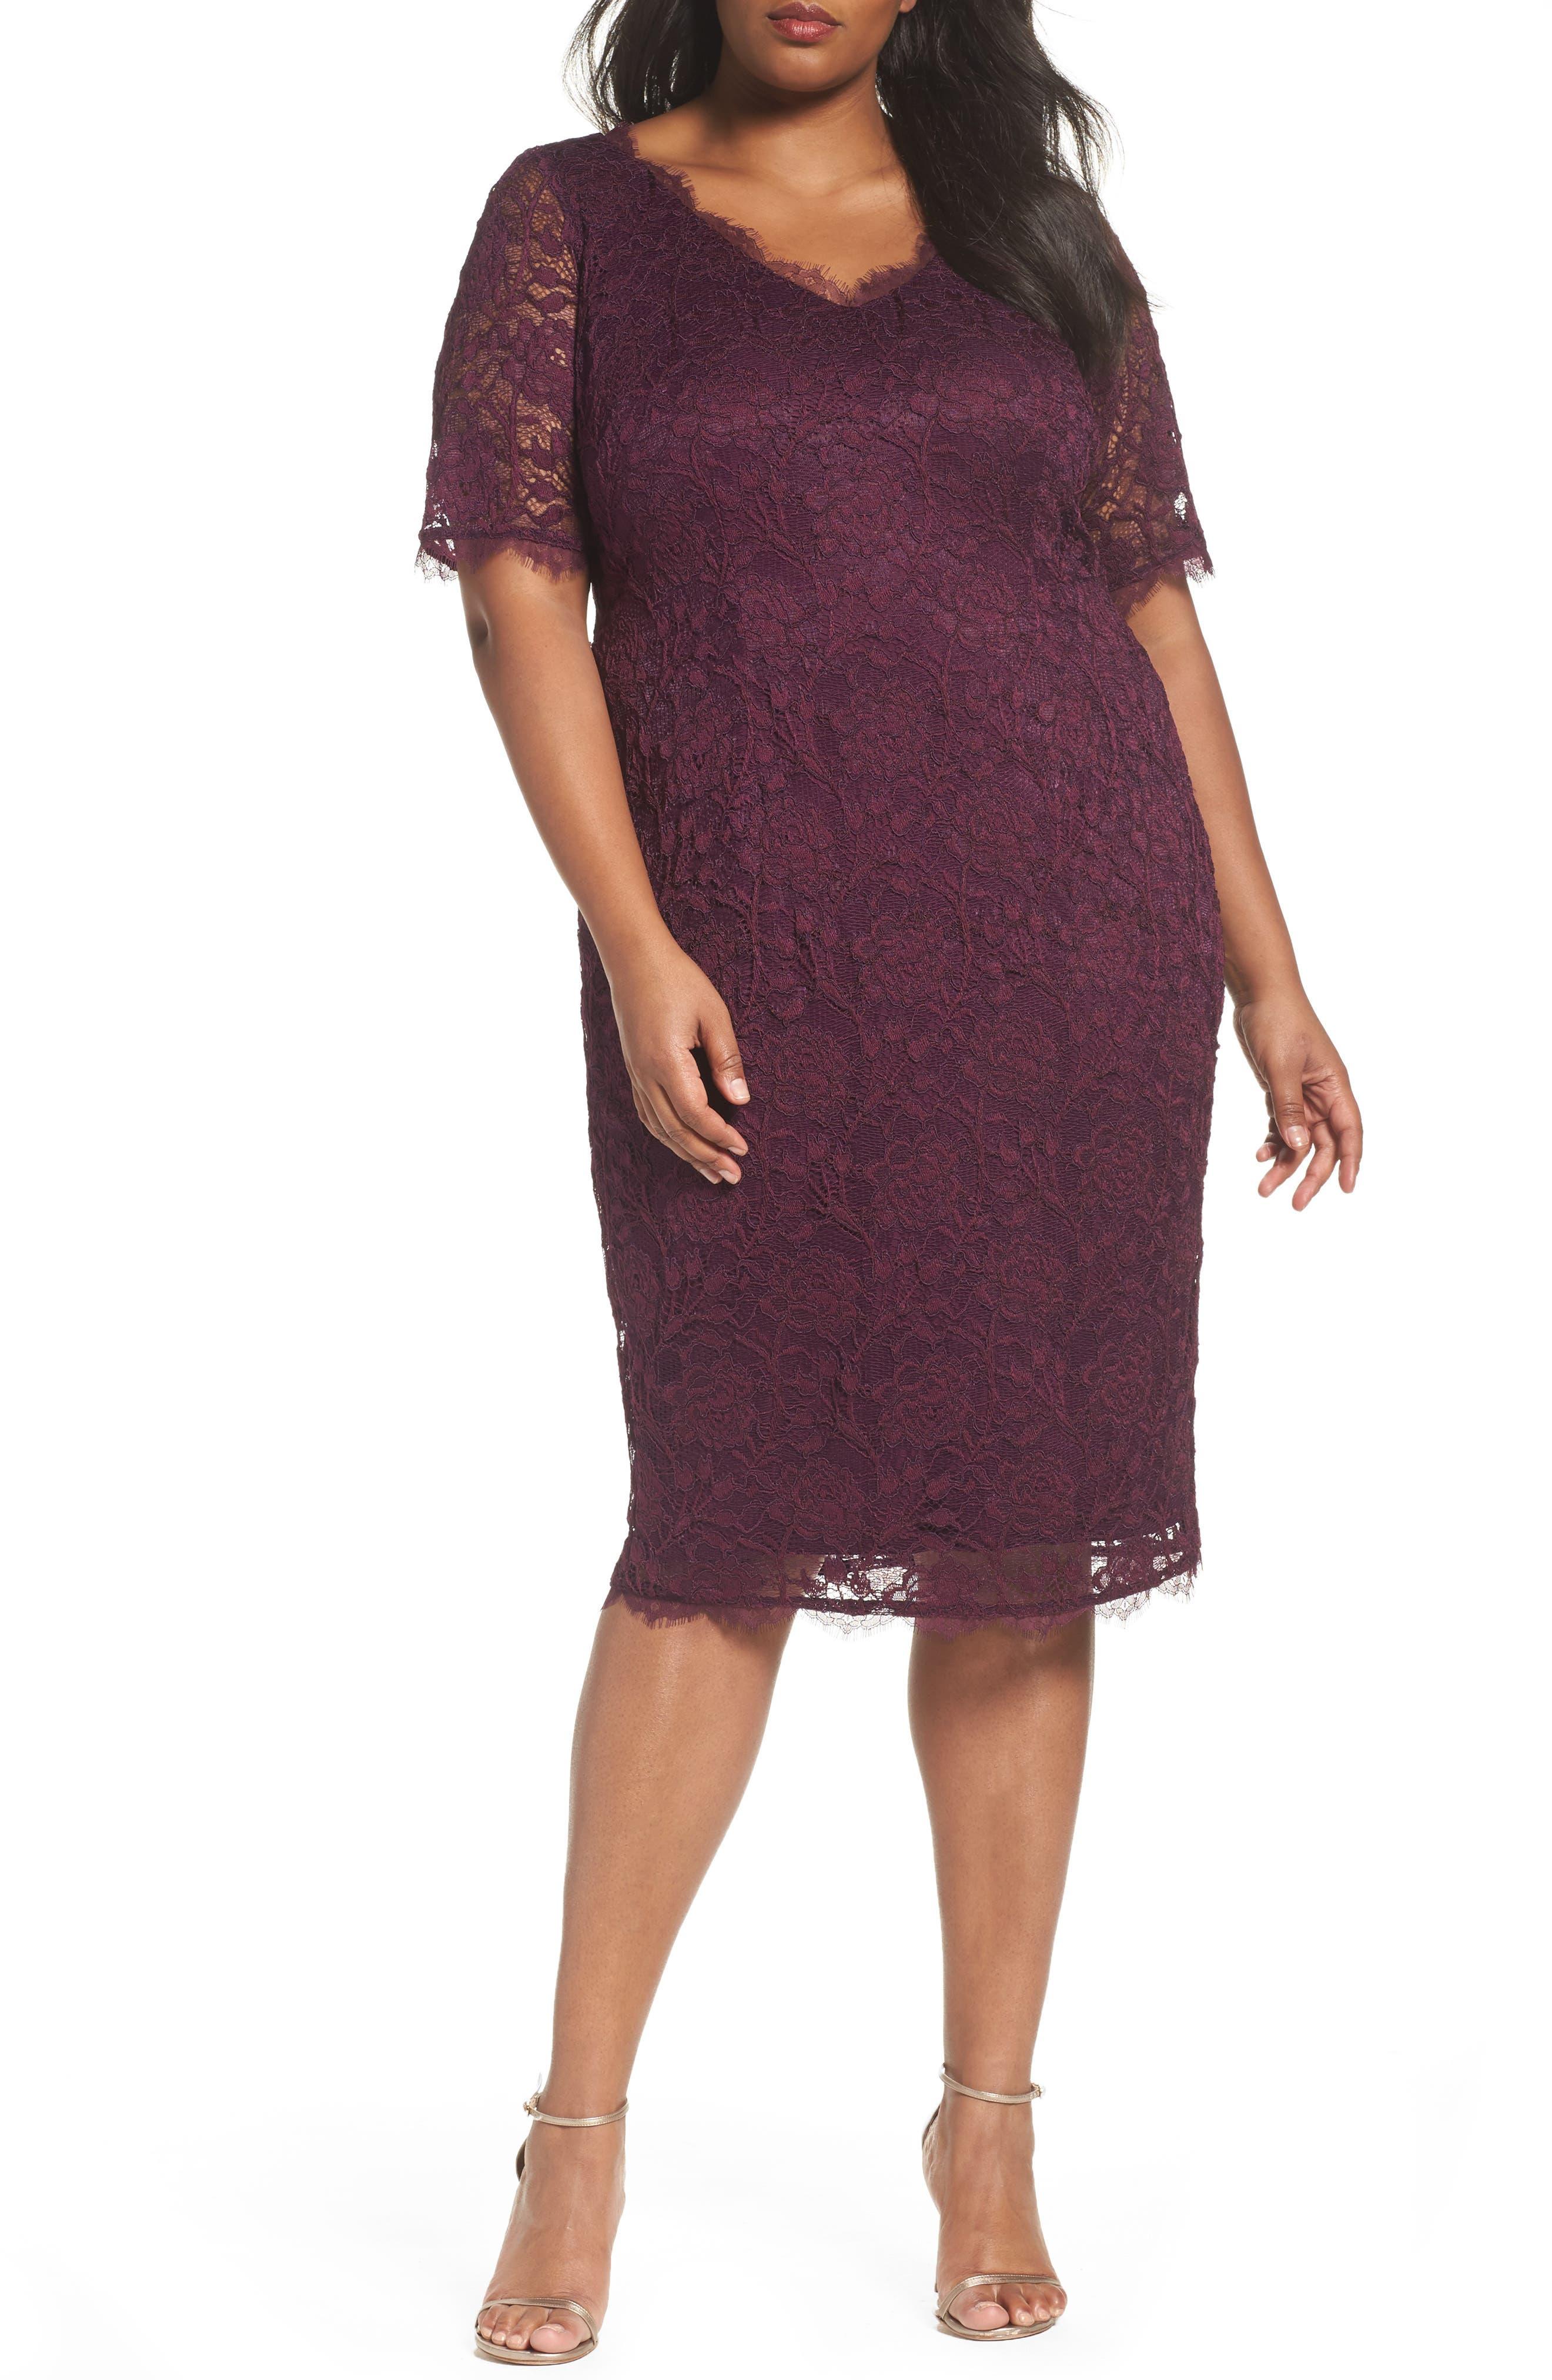 Adrianna Papell Rose Lace Sheath Dress (Plus Size)